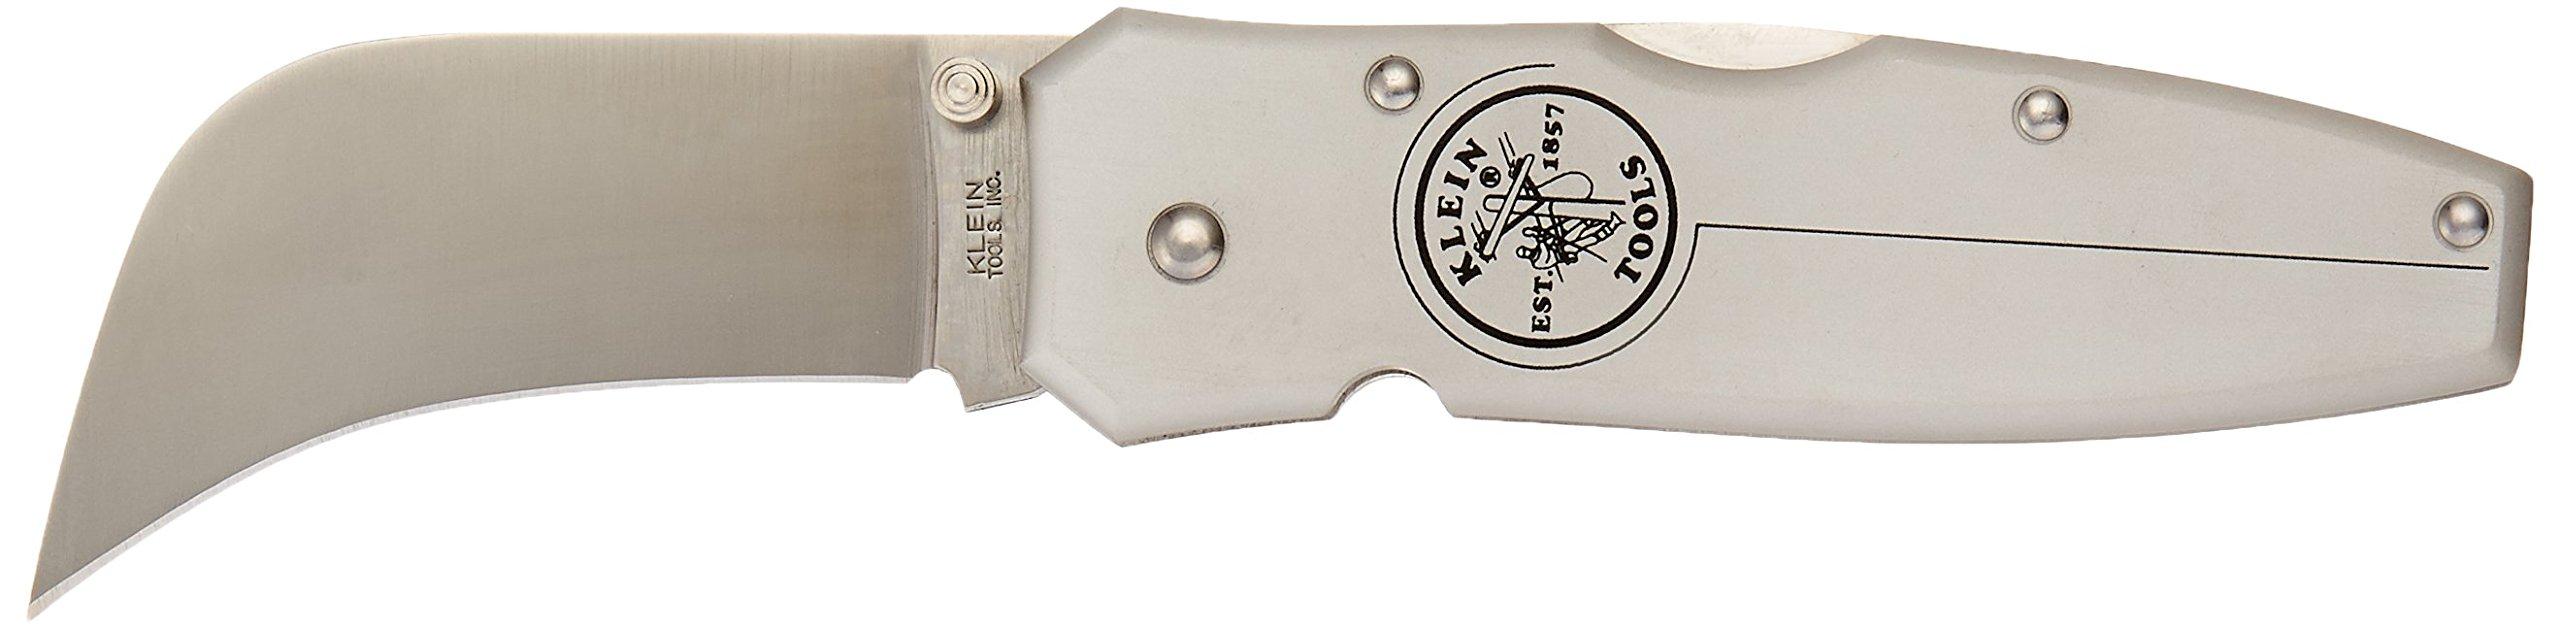 Lockback Knife 2-5/8-Inch Aluminum Handle Klein Tools 44006